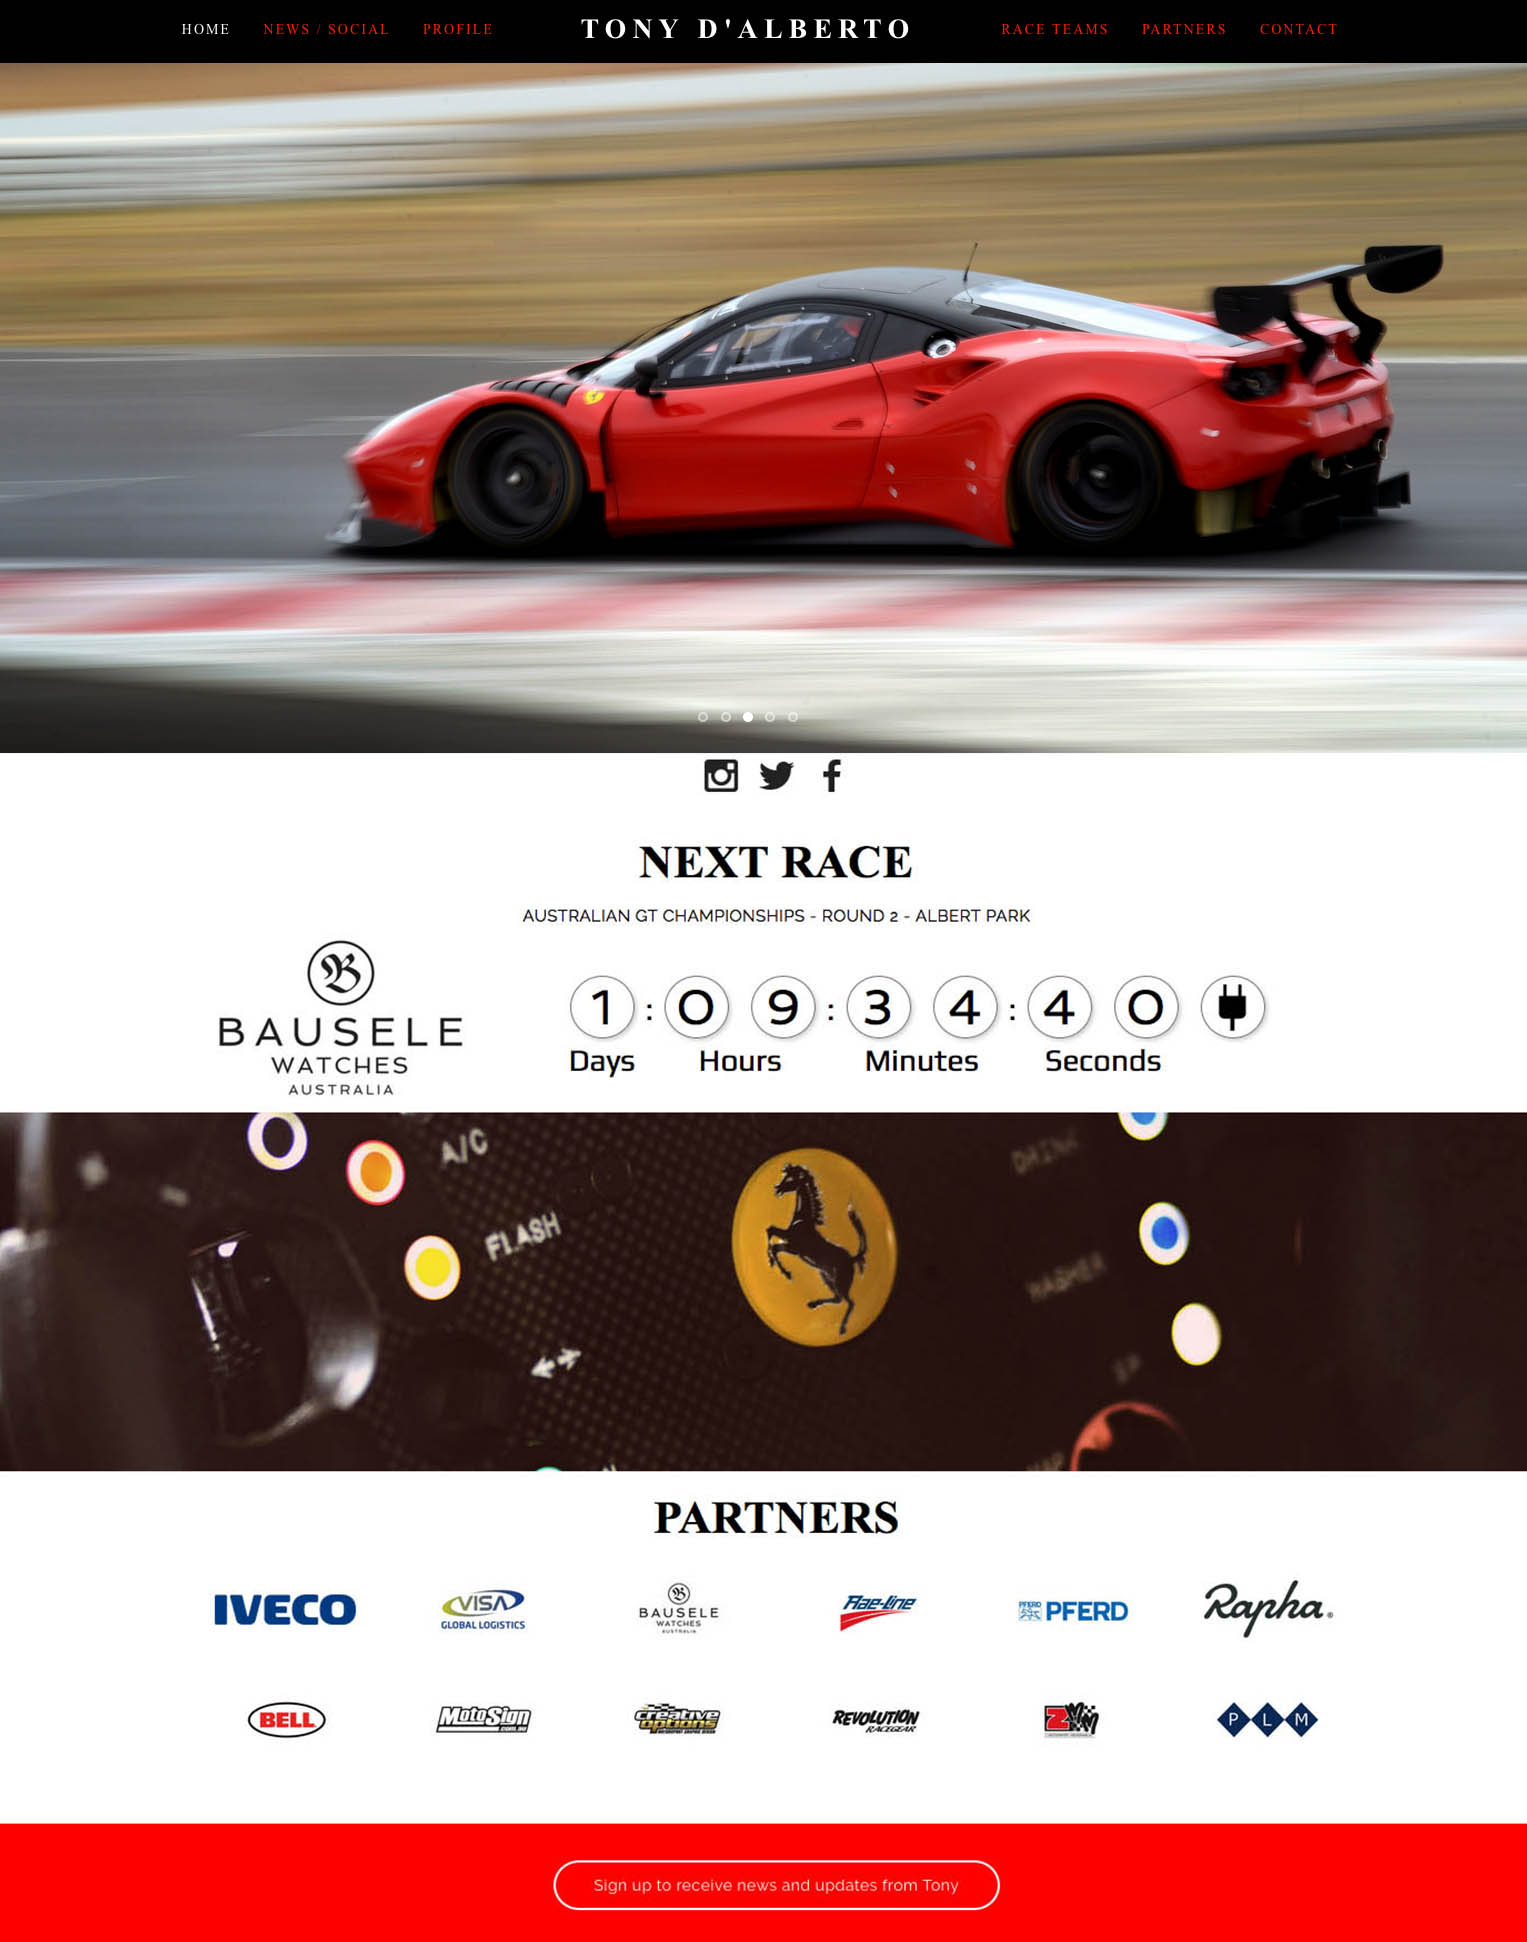 website of V8 Supercar DJR Team Penske and Ferrari GT driver TONY D'ALBERTO is designed, installed and updated by PLM